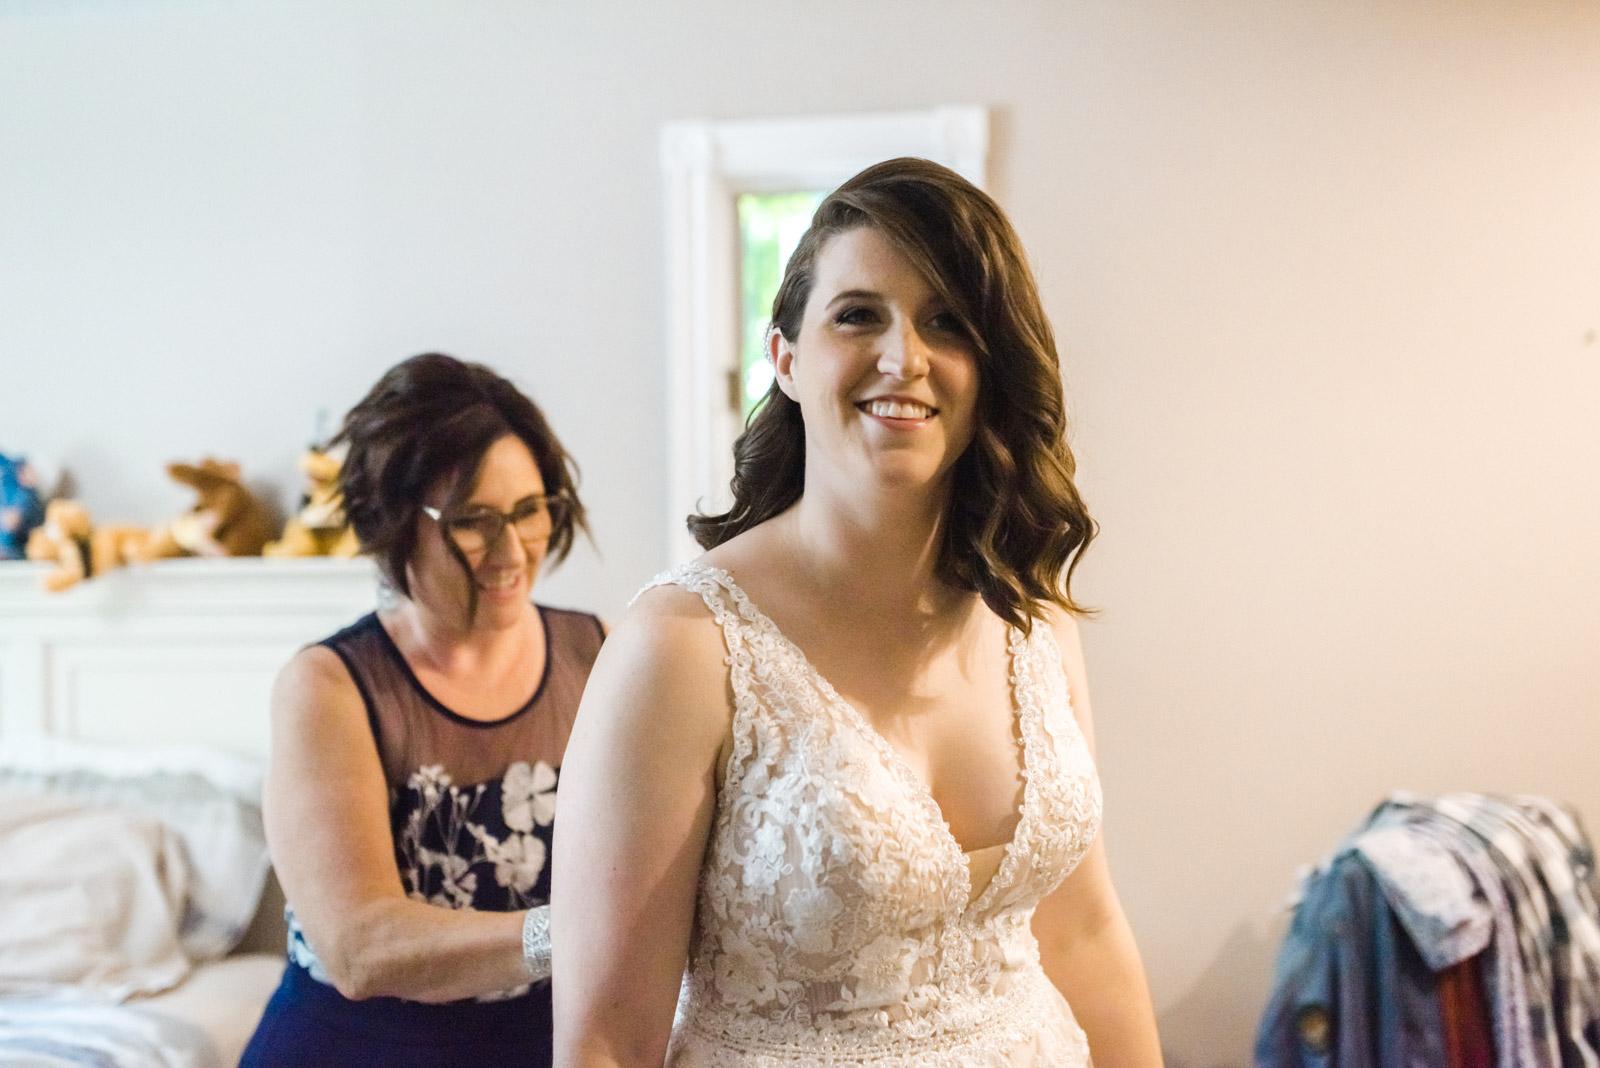 Emerson & Elicia's Golf Course Wedding Aidan & Leanne Hennebry Hamilton Wedding Videographers Photographers Niagara Hush Hush Photography & Film-2.jpg